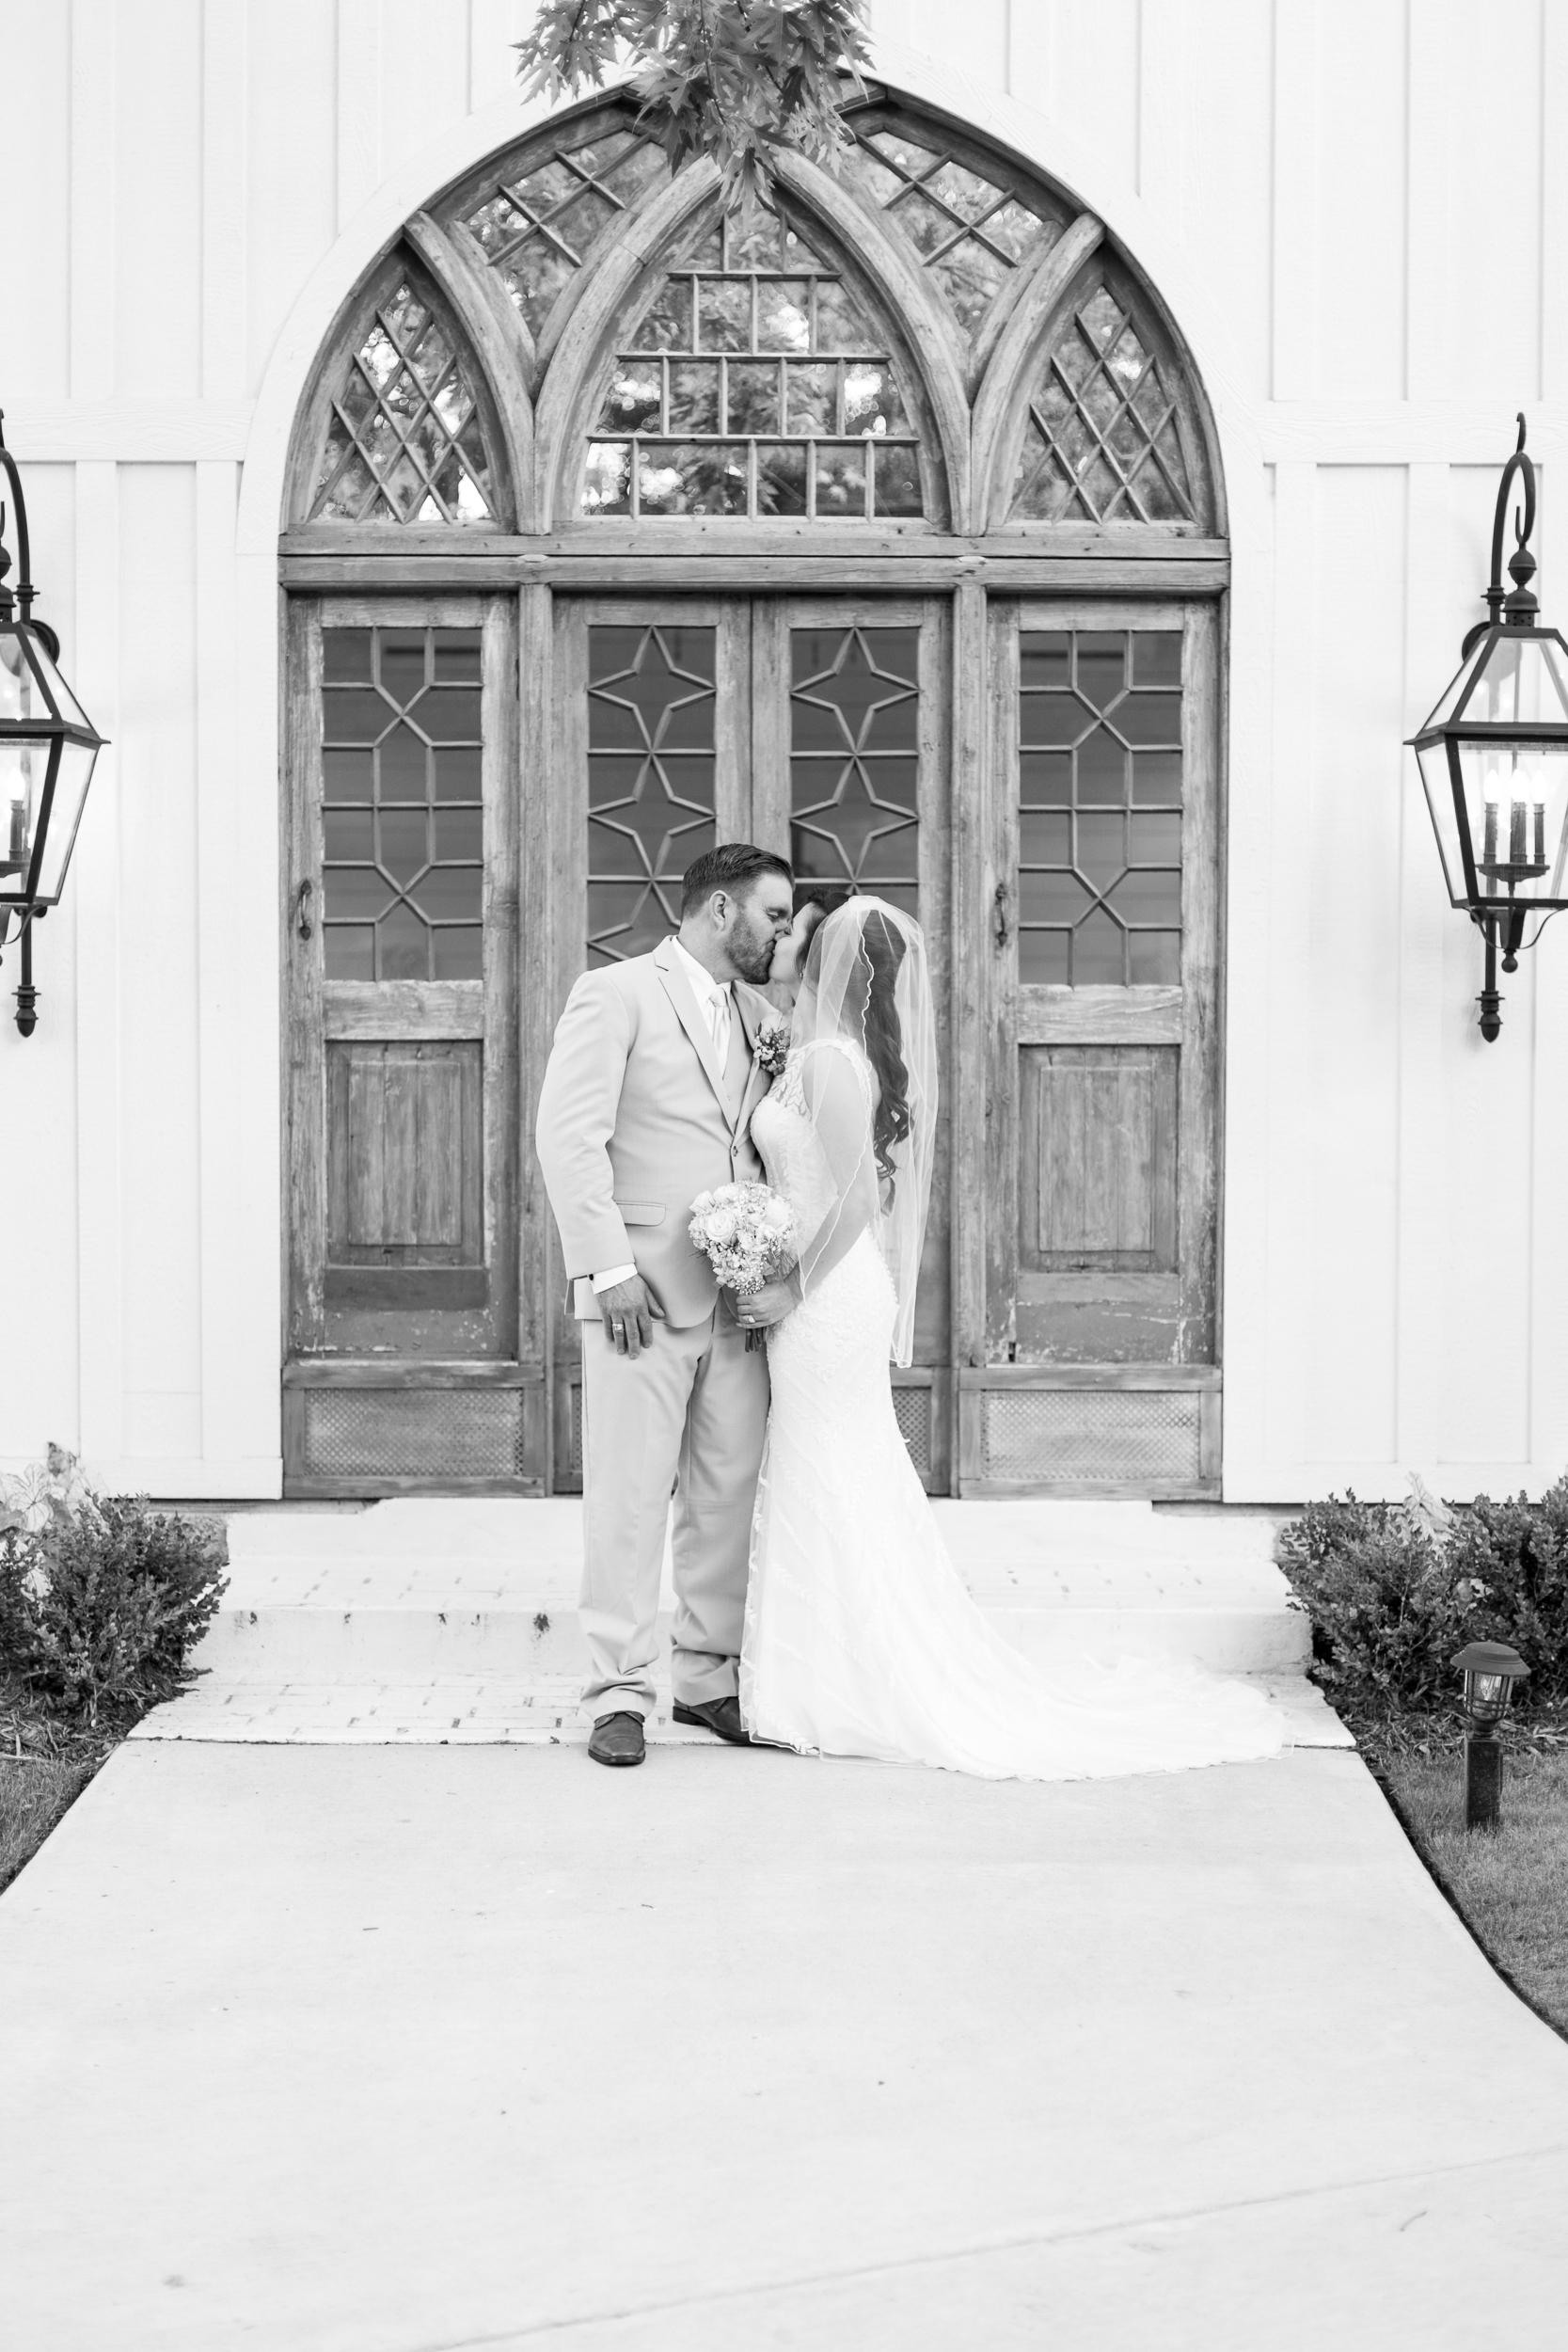 Zihlman-East TX Wedding_Kelsie Hendricks Photography_The Folmar Tyler Texas-116.jpg